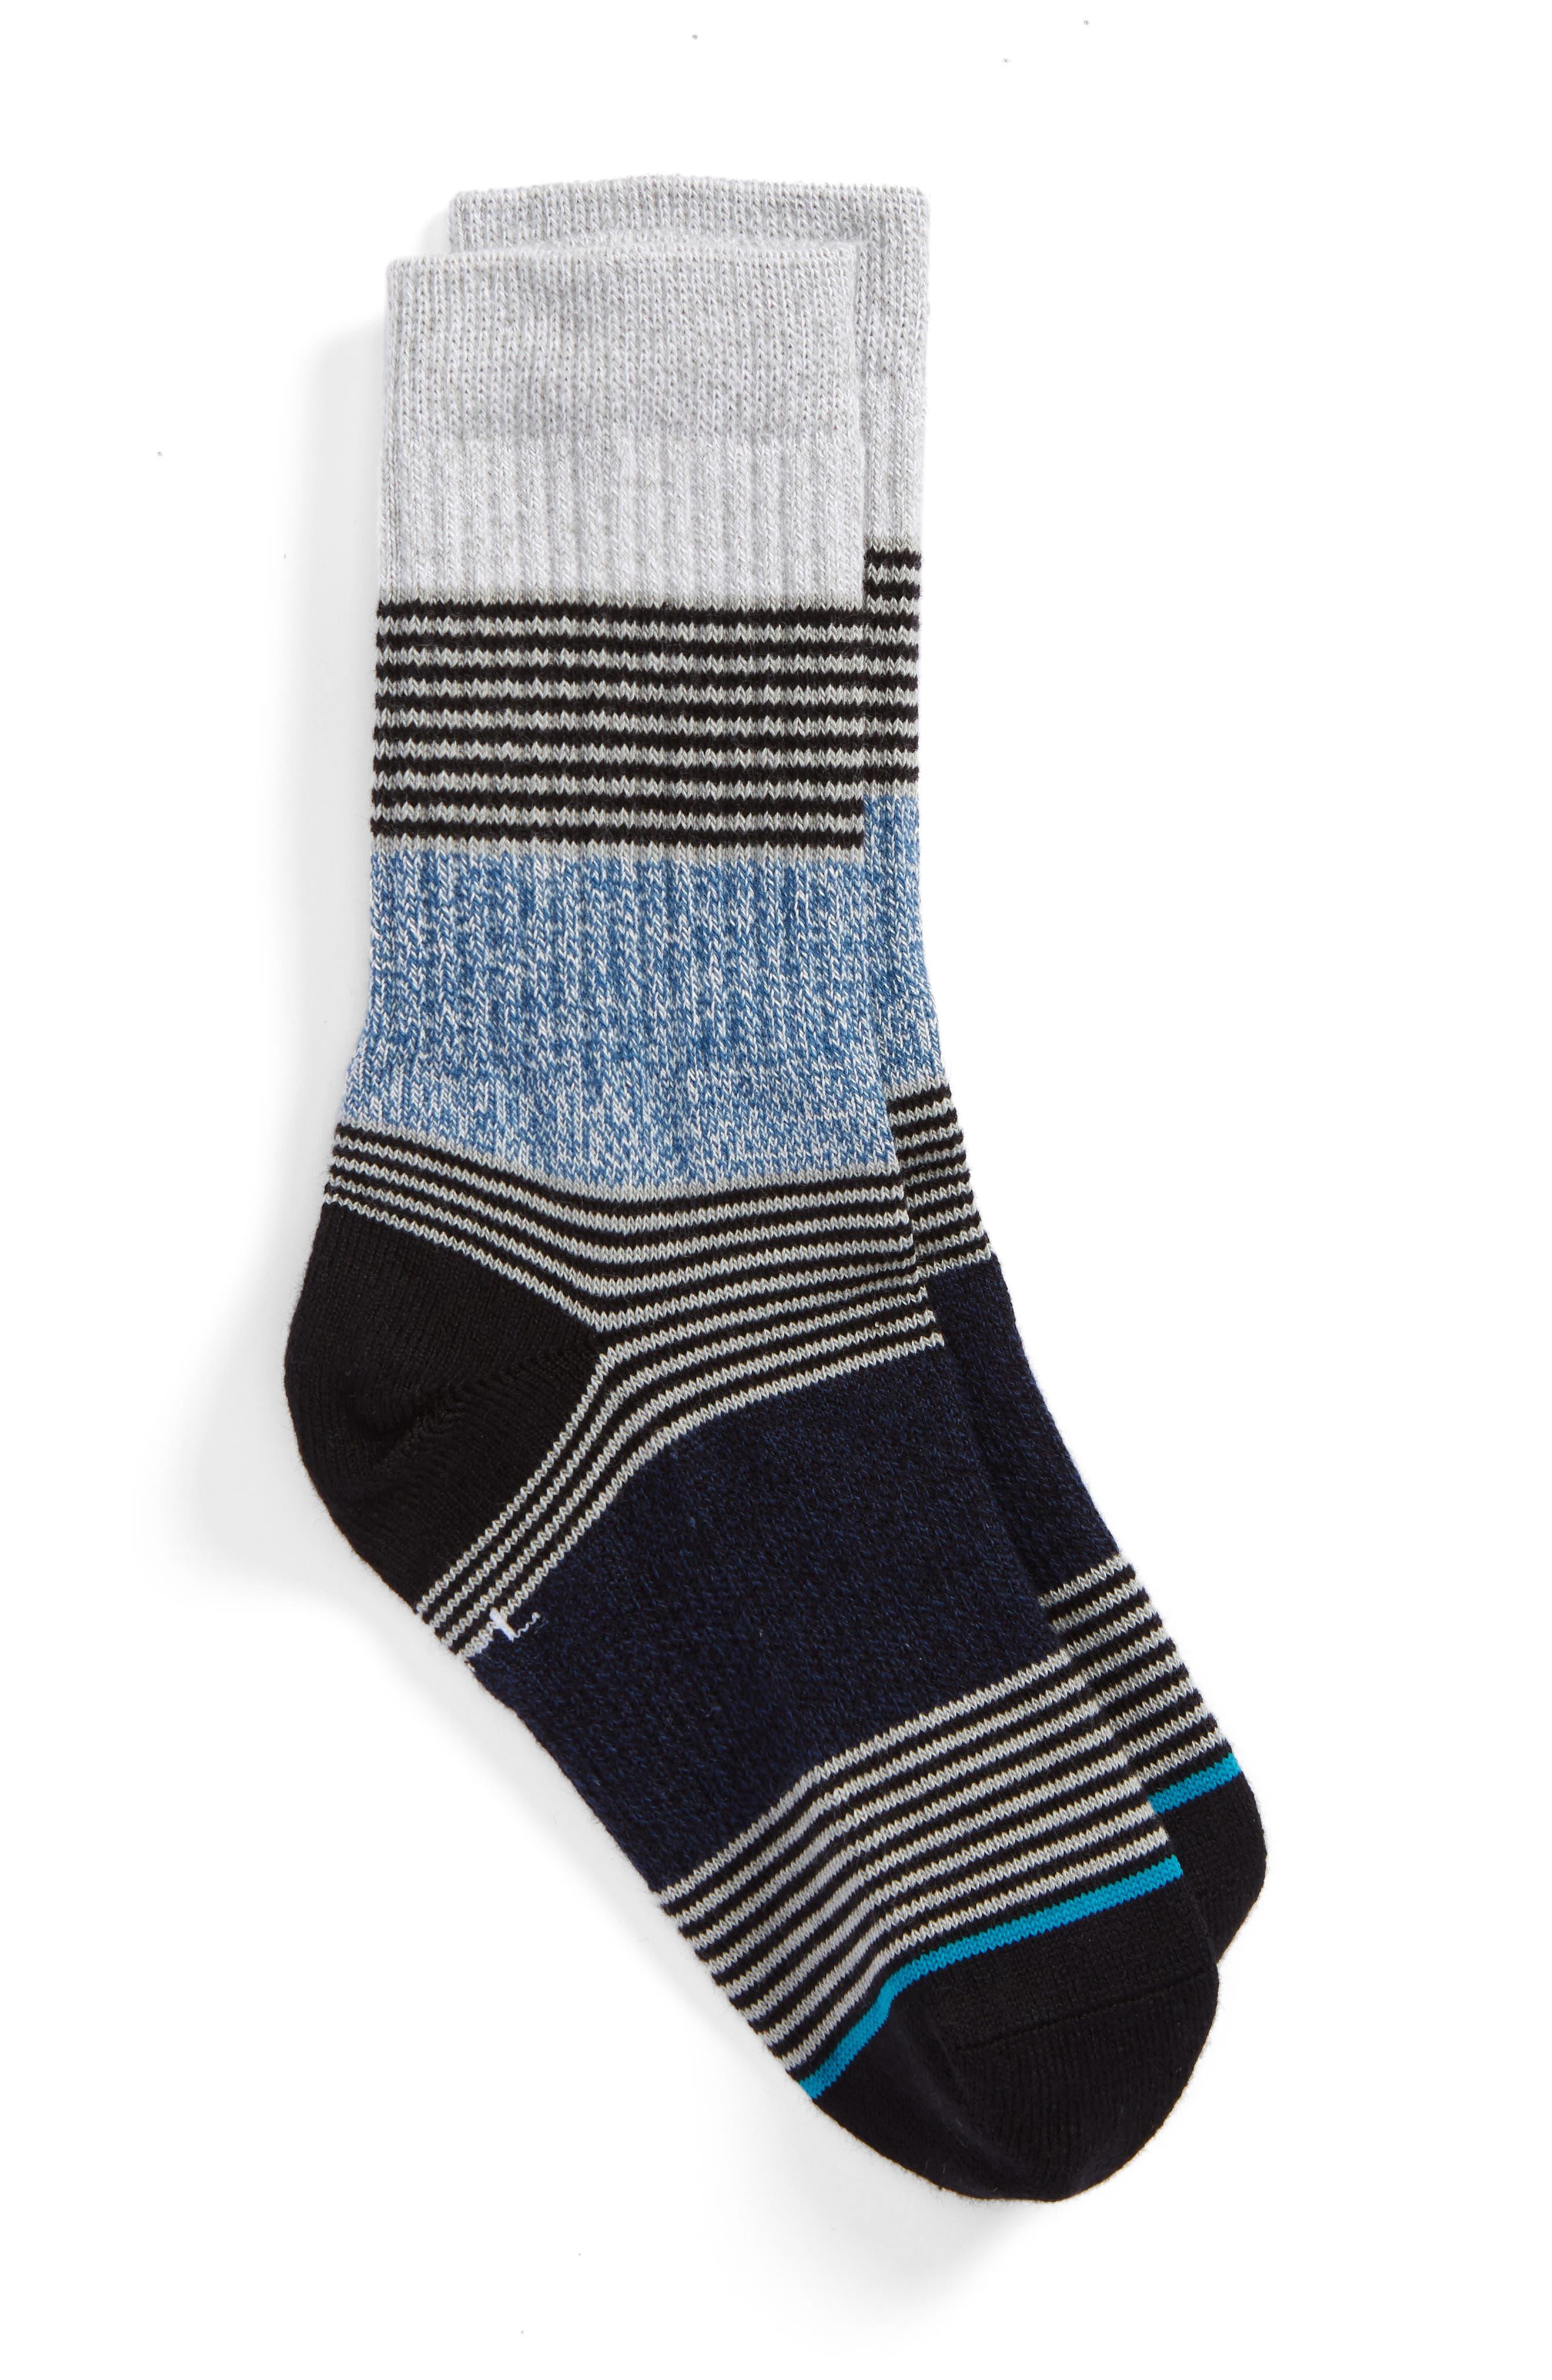 Alternate Image 1 Selected - Stance Nagano K Socks (Kid)